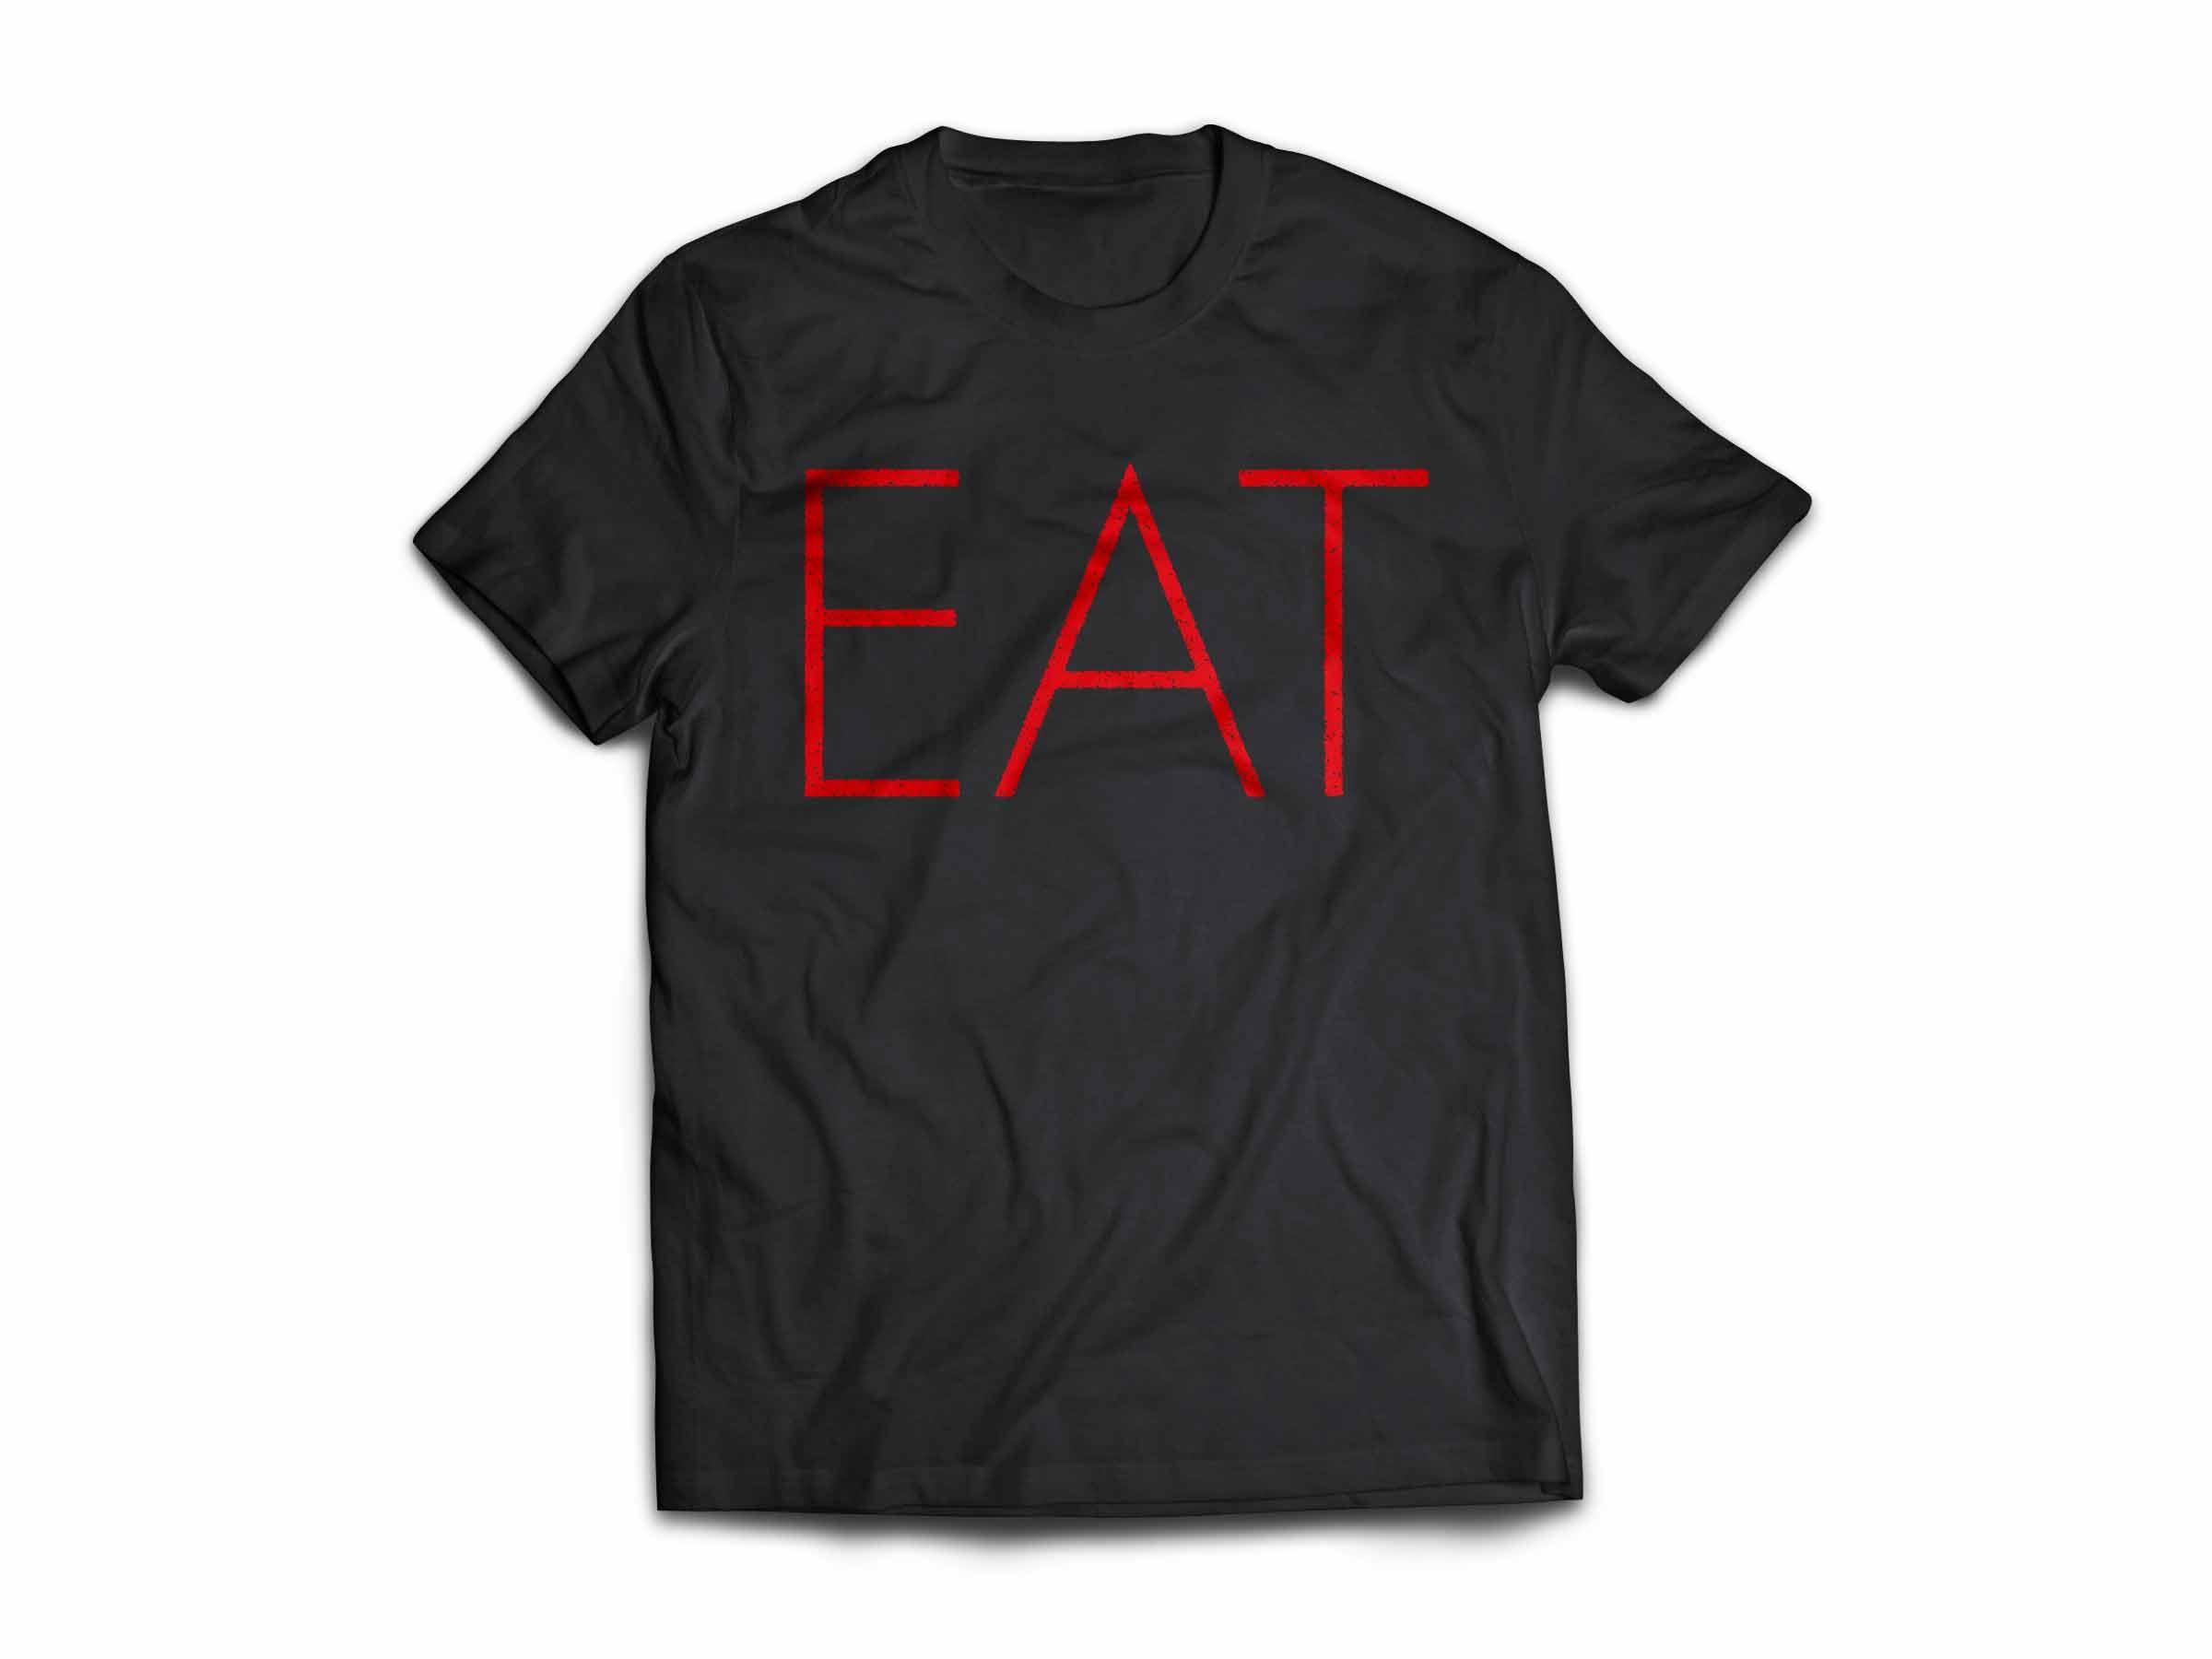 EAT-TYPESHIRT-REDonBLACK-WEB.jpg